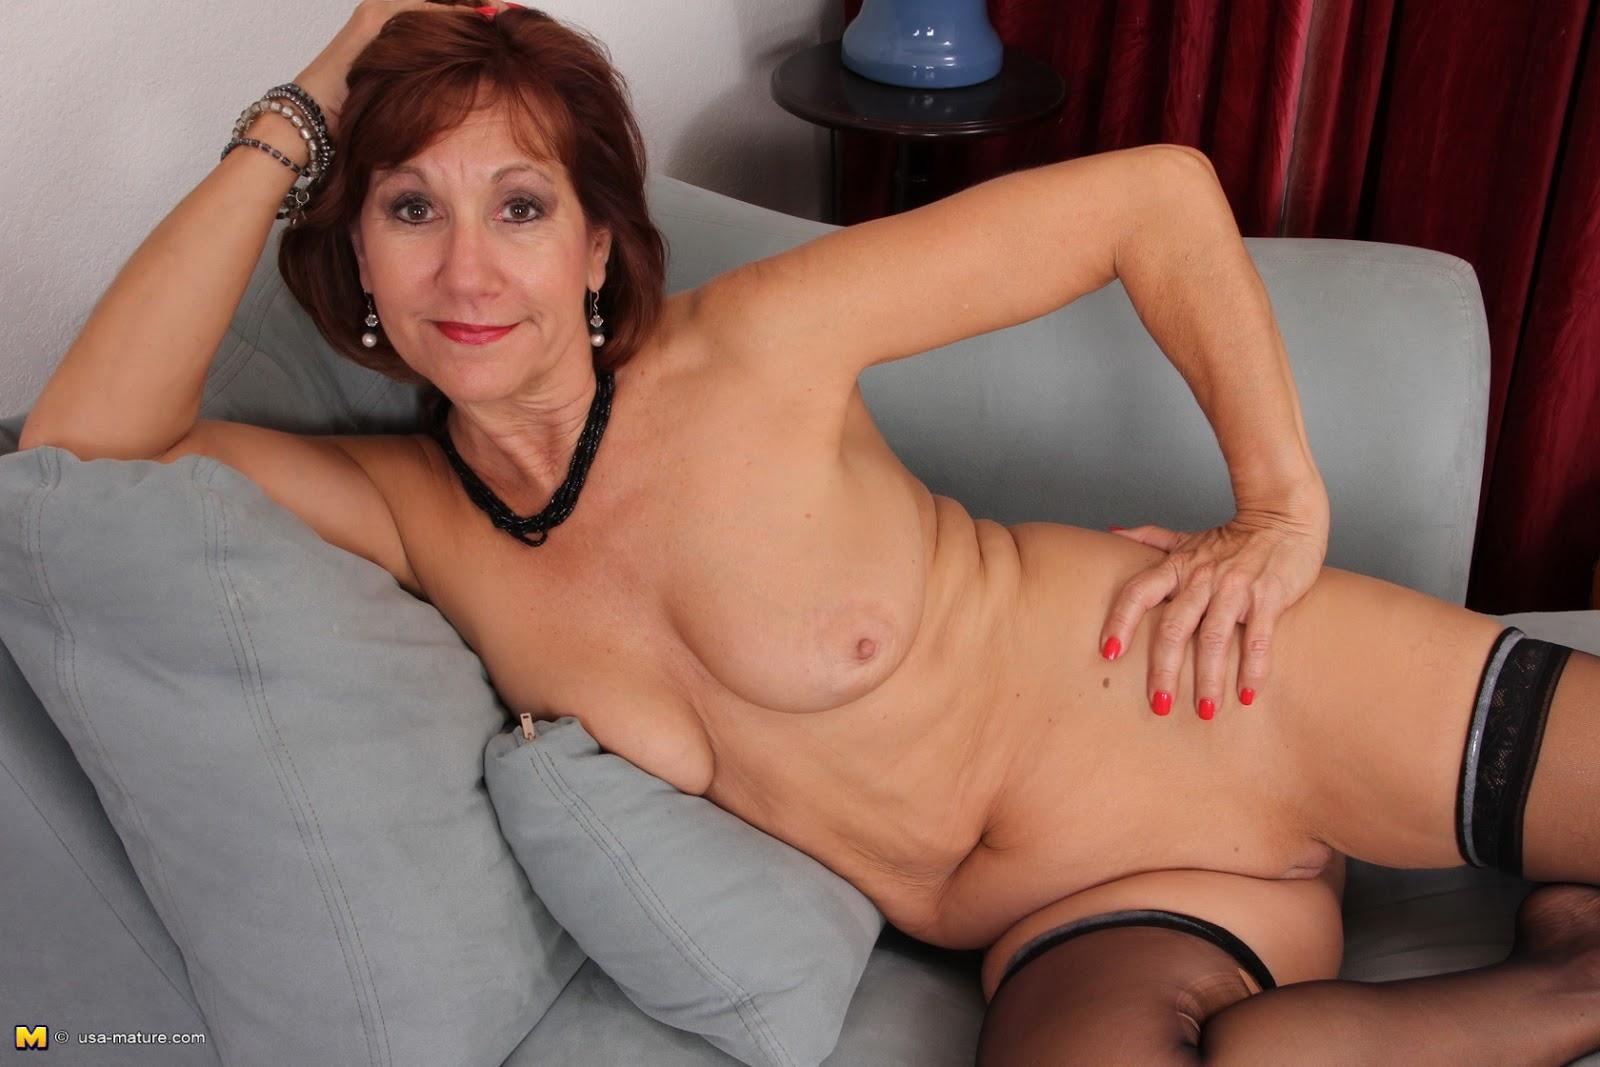 Breast dent